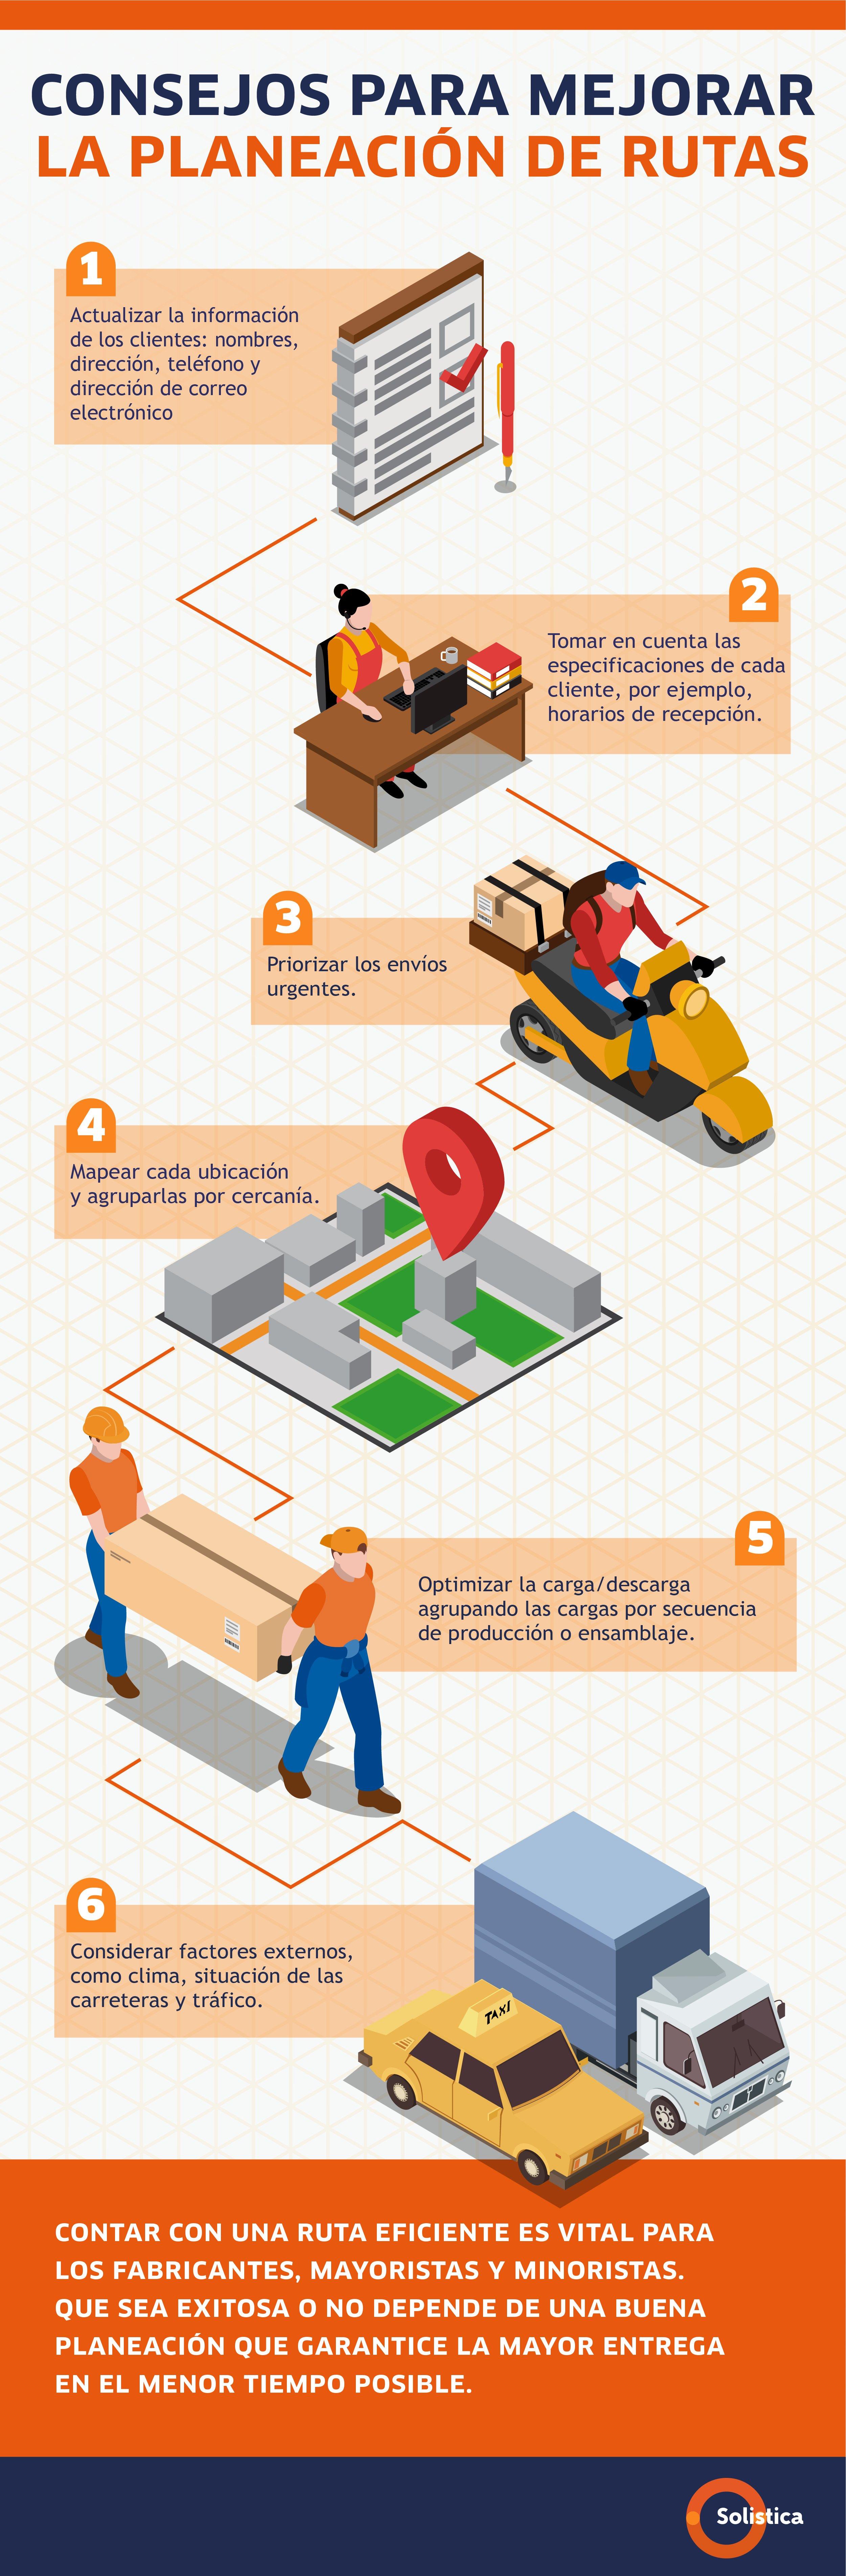 SOL-Infografia-Consejos para la mejor planeacion de rutas v2